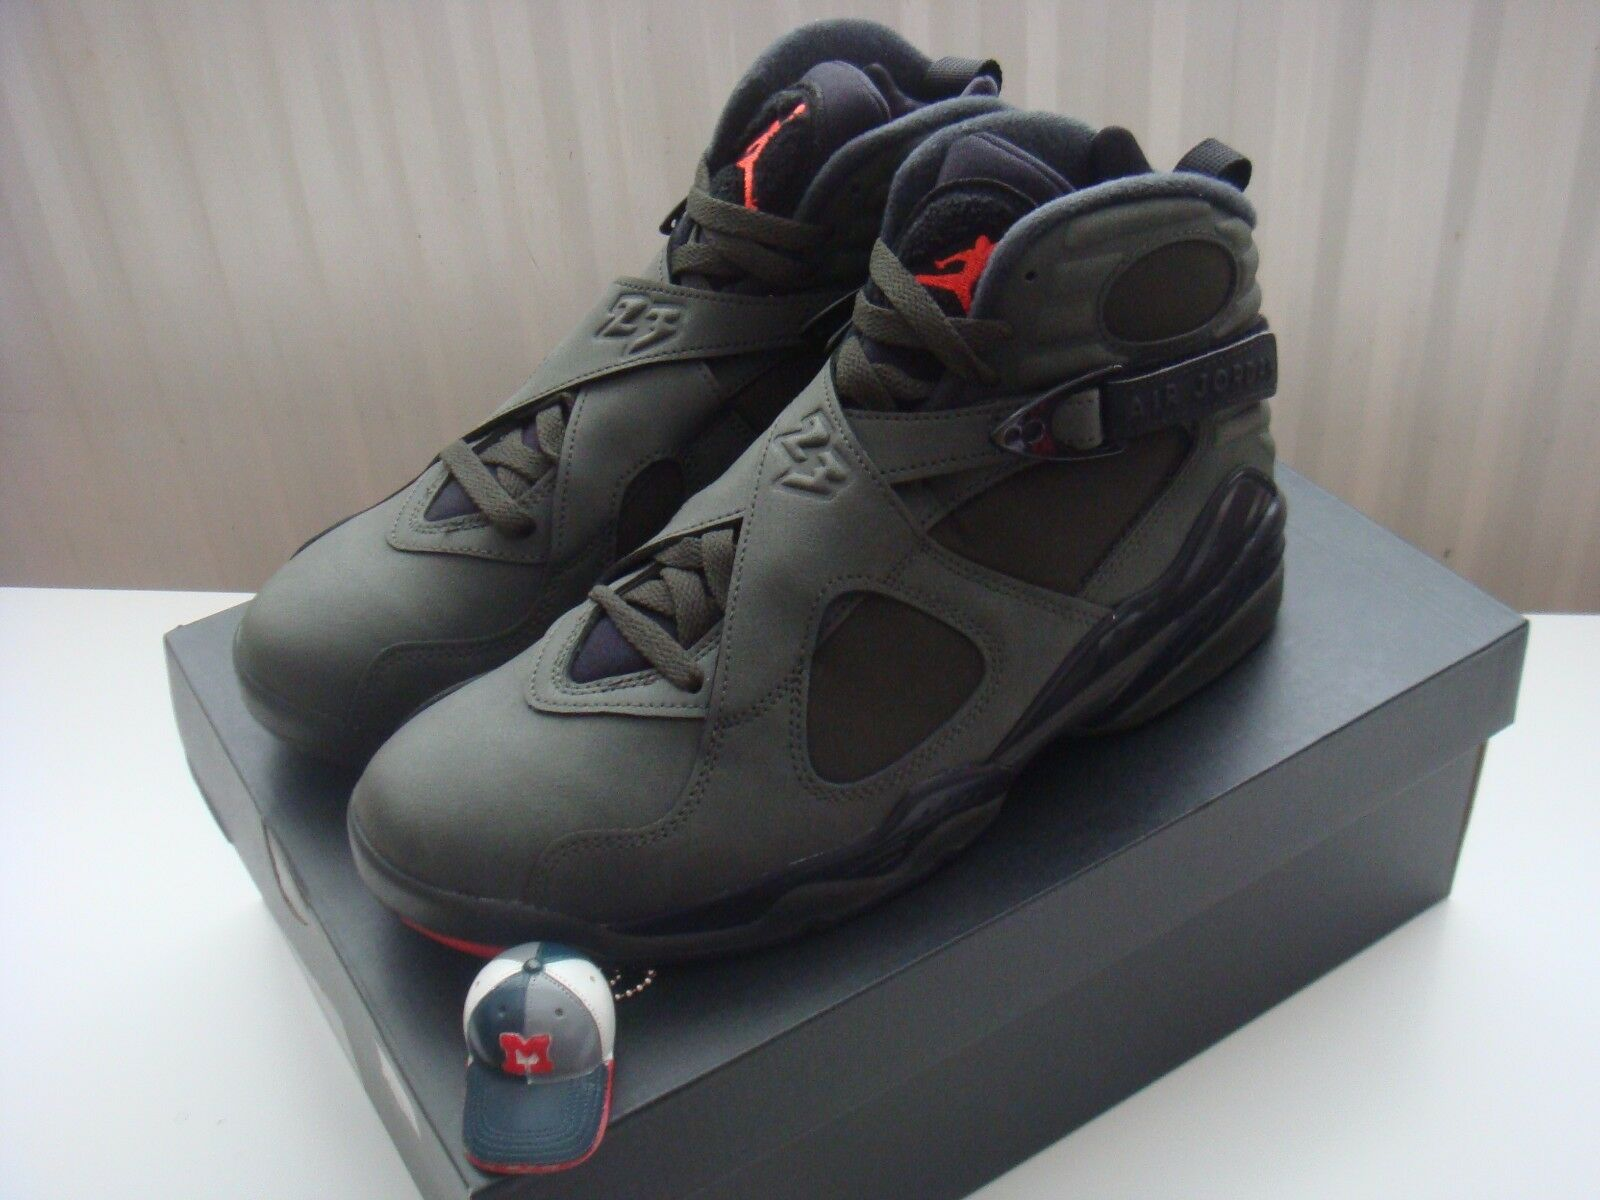 Nike Air Jordan VIII 8 Retro Take Flight US 9.5/UK 8.5 Olive/Undftd/Playoff/Aqua